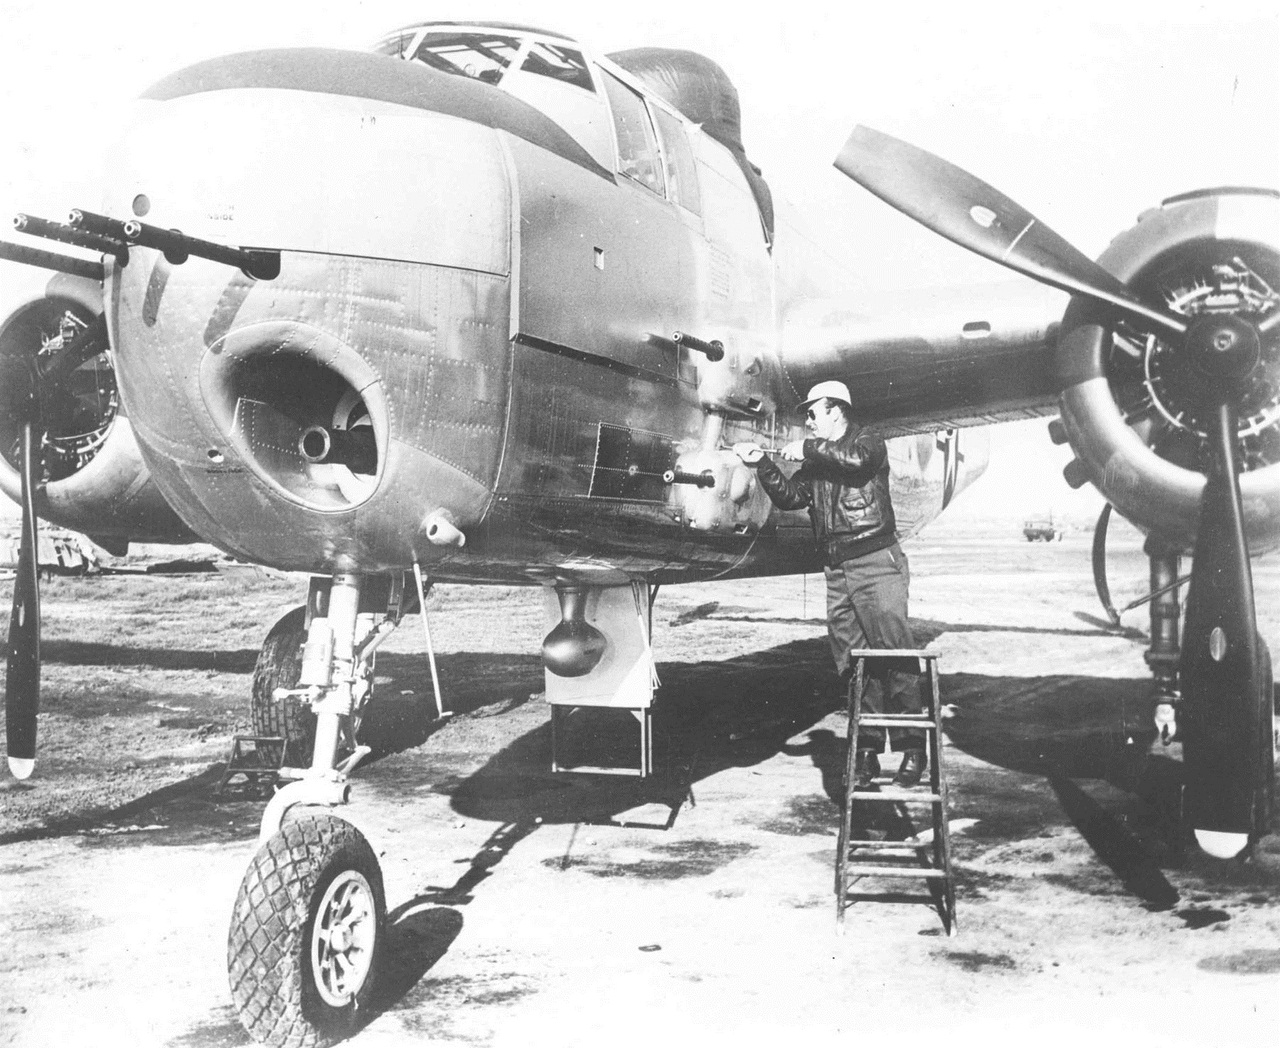 North American B-25H